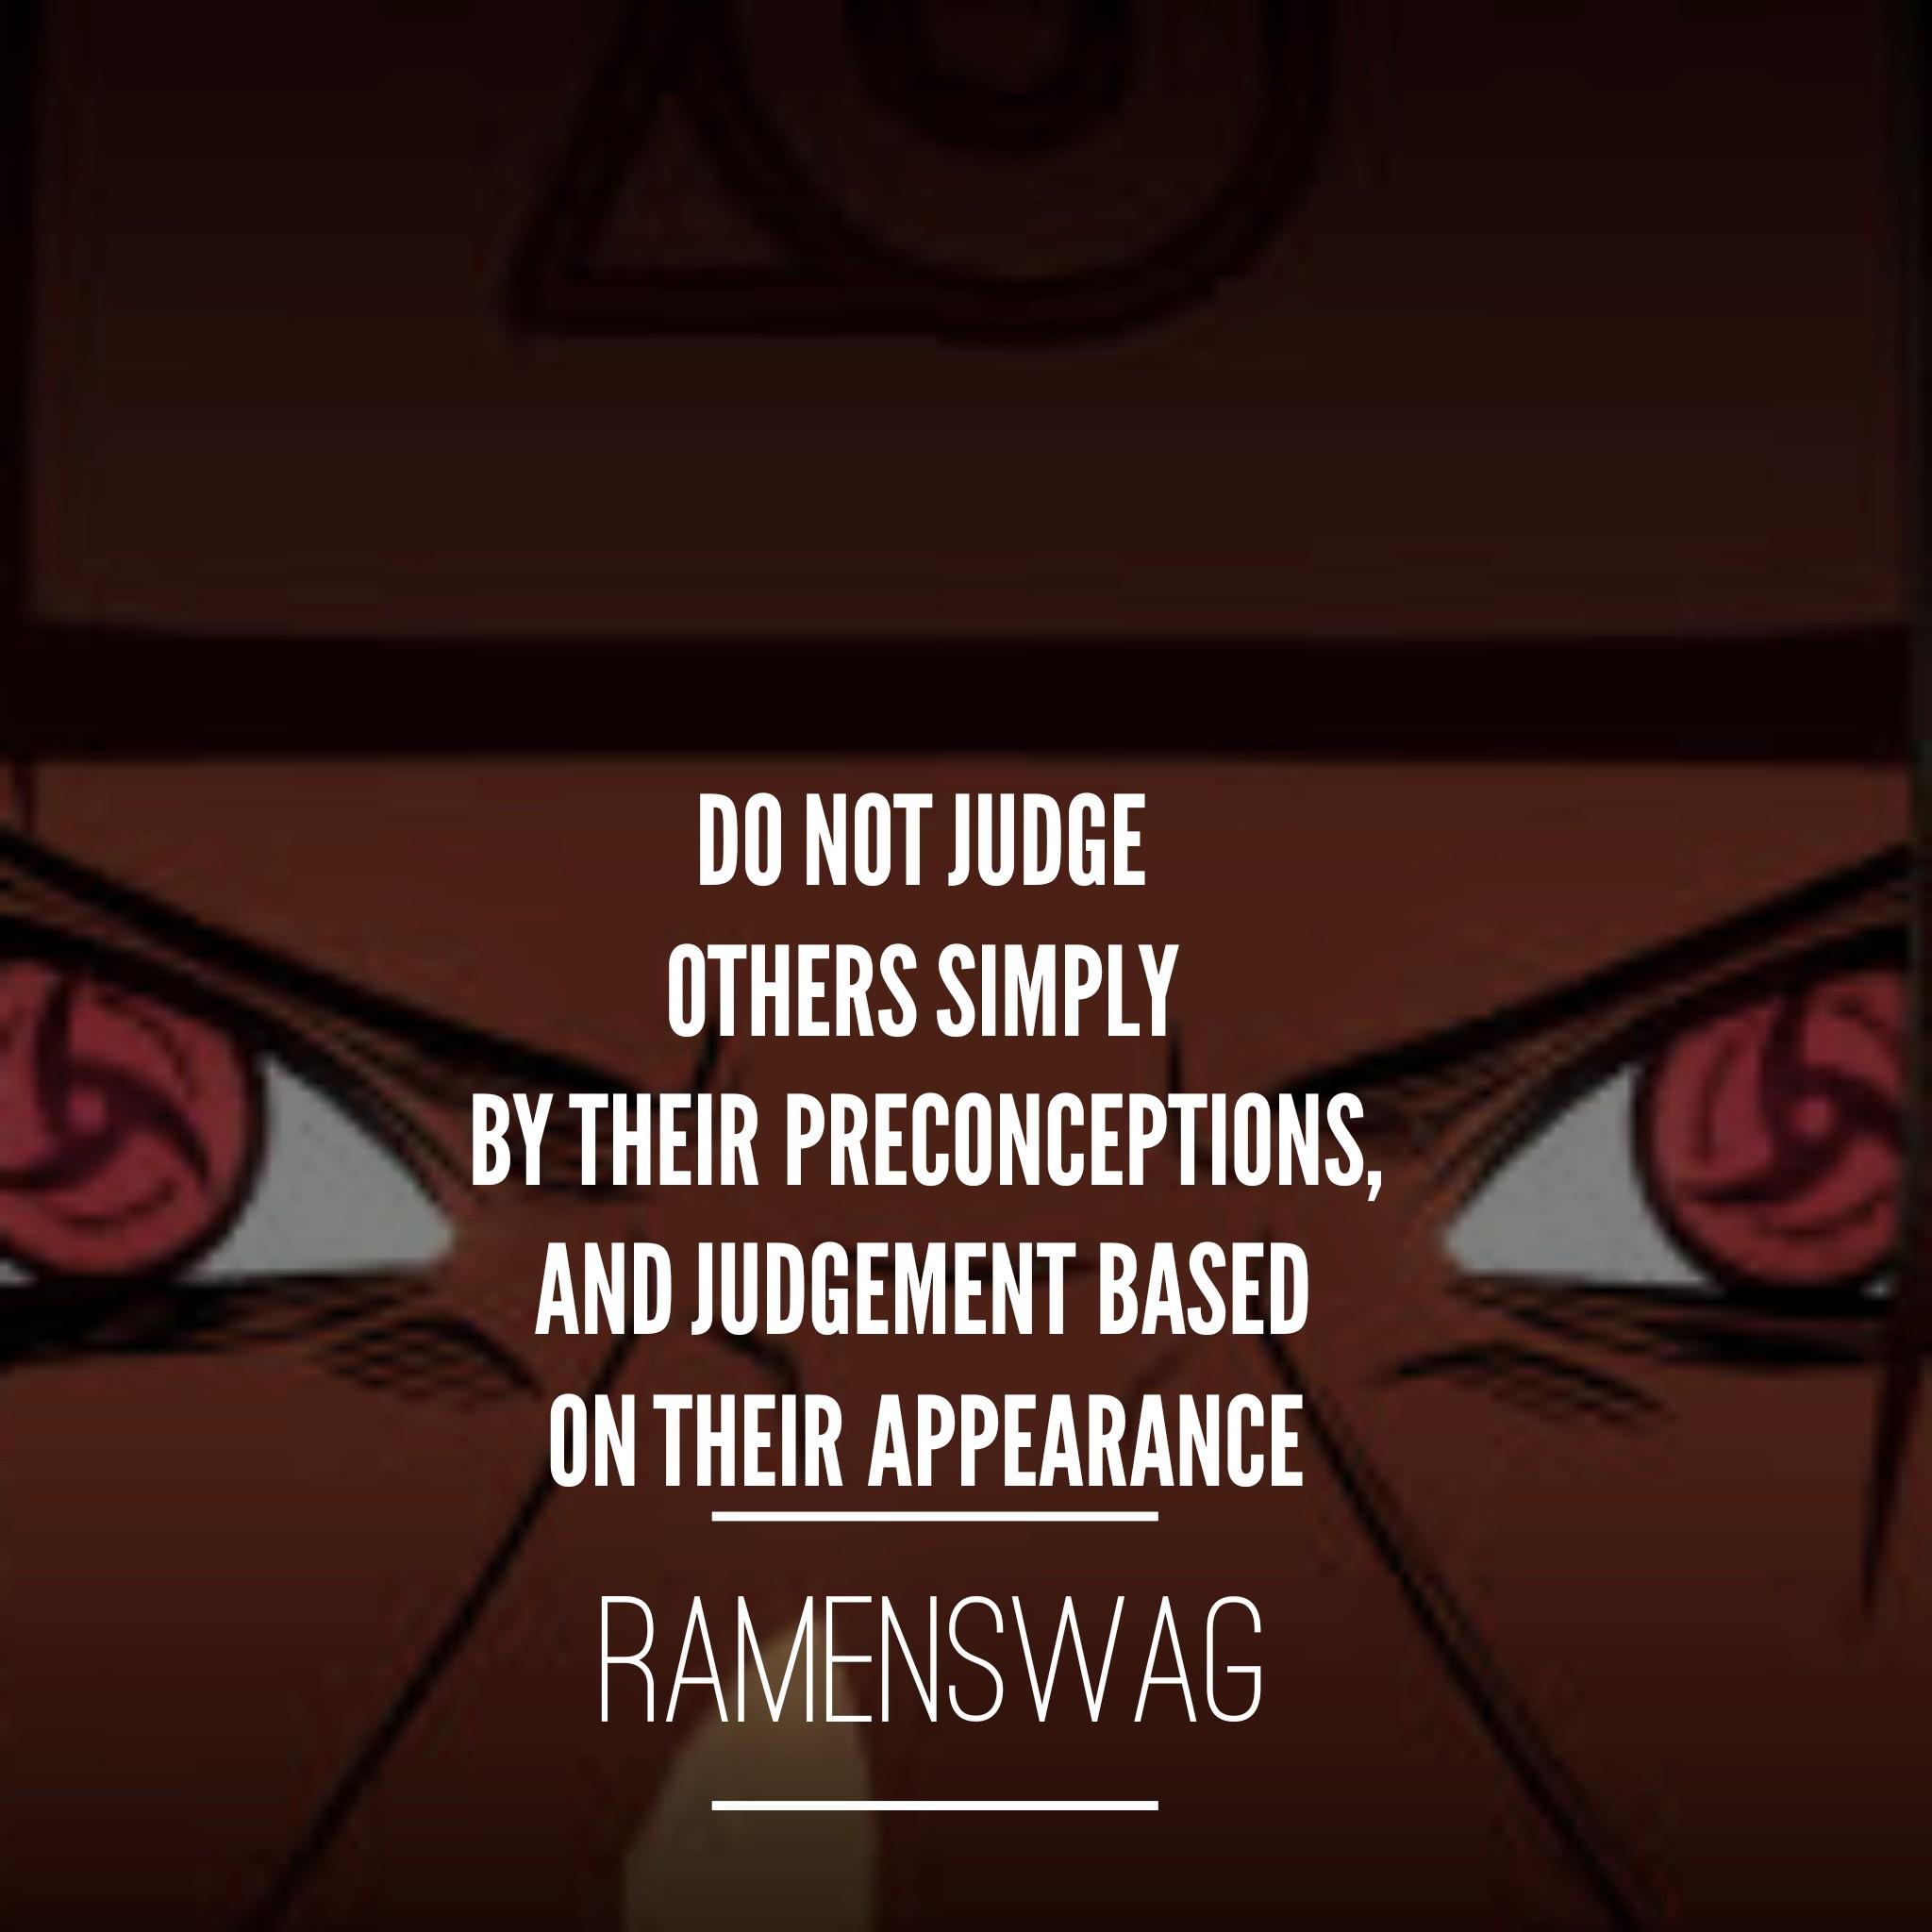 uchiha itachi quotes on judging others based on appearance ...